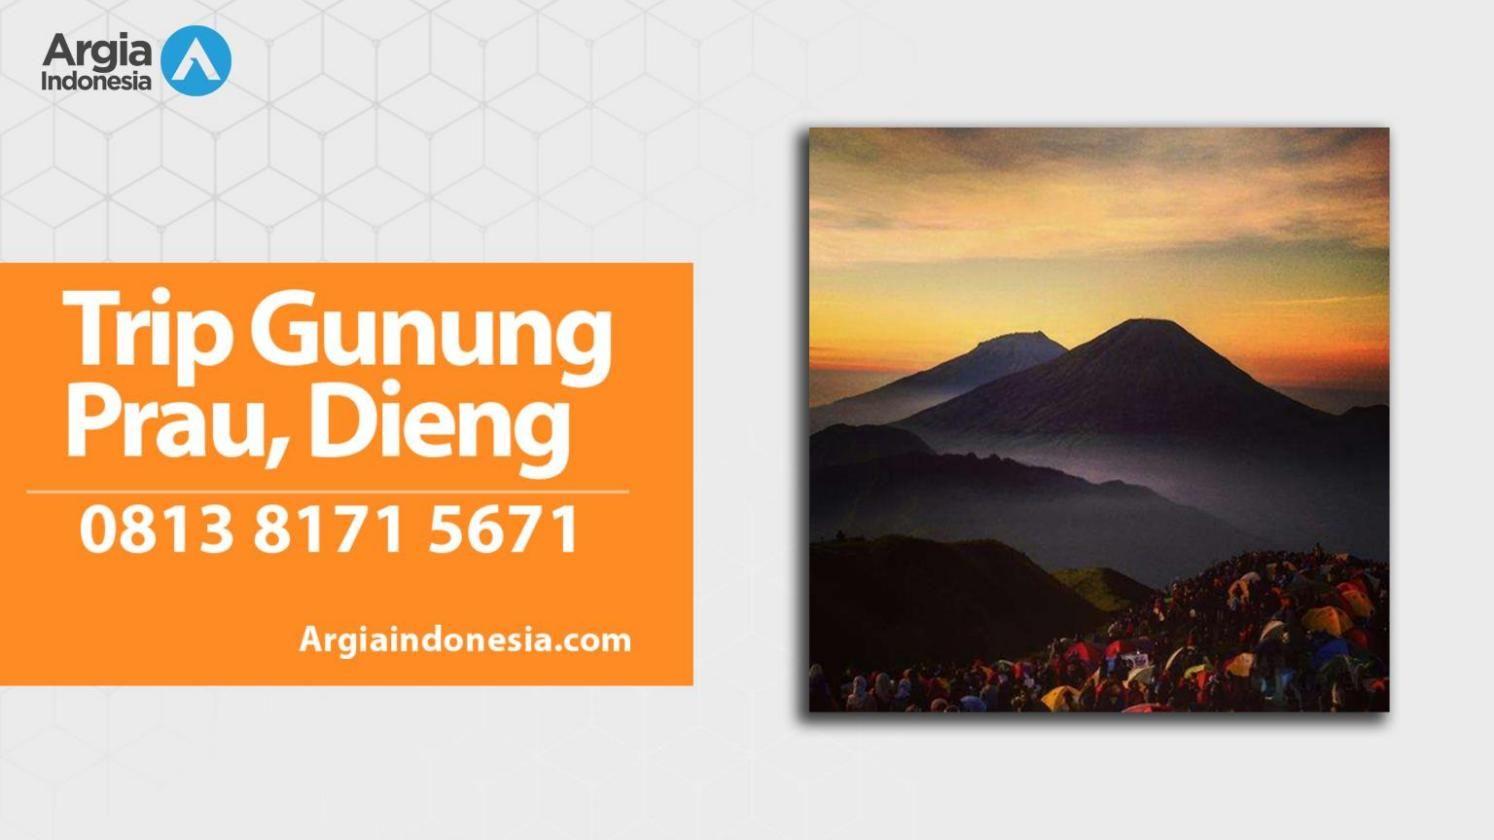 Wa 0813 8171 5671 Paket Wisata Bukit Sikunir Dieng Wonosobo Beach Fiesta  Ke Bali Dan Lombok Travel Murah Trip Obyek Di Gunung